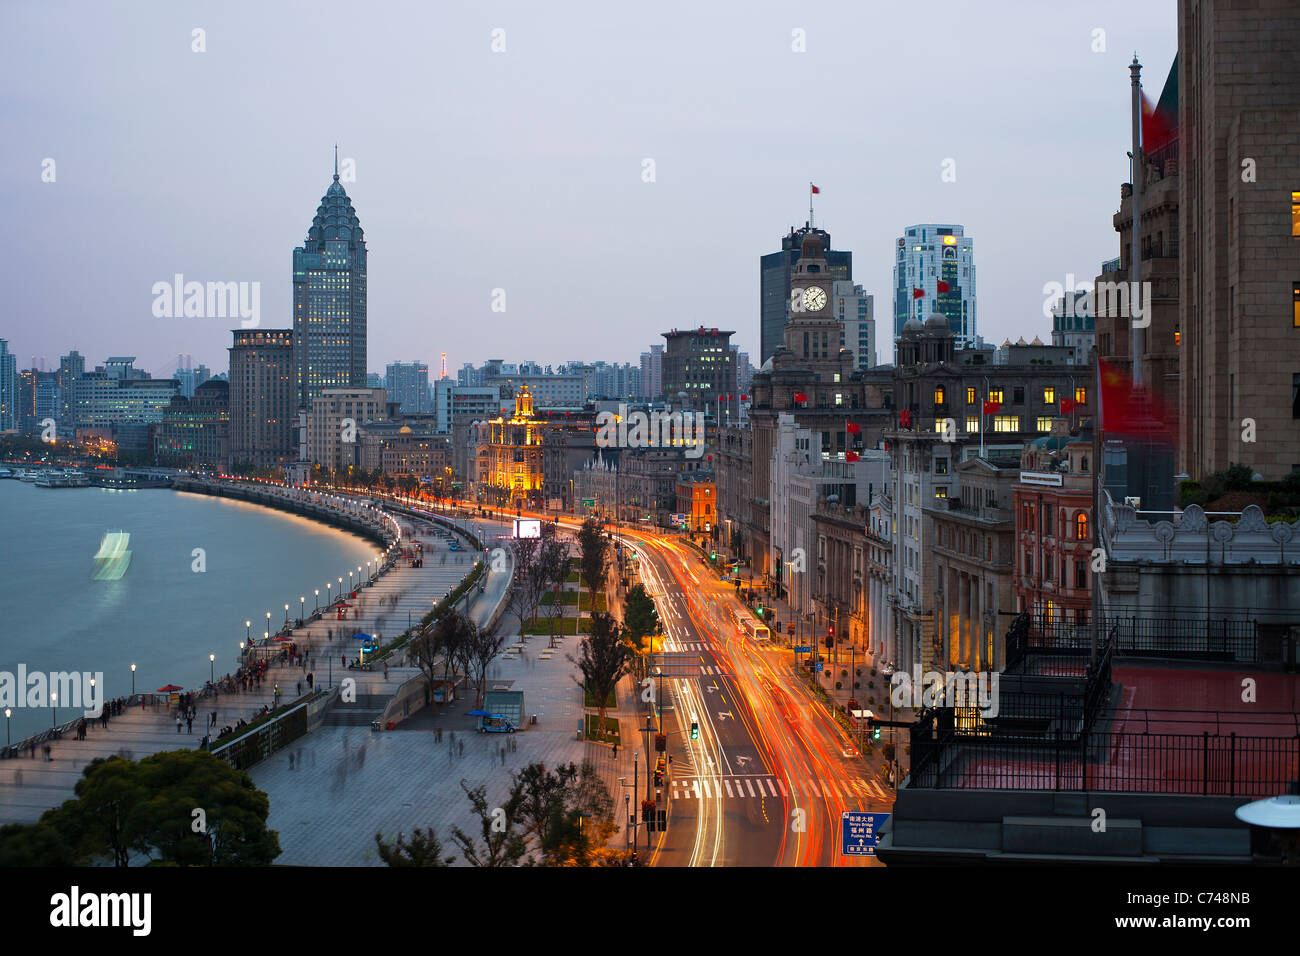 View along the Bund at night, Shanghai, China - Stock Image